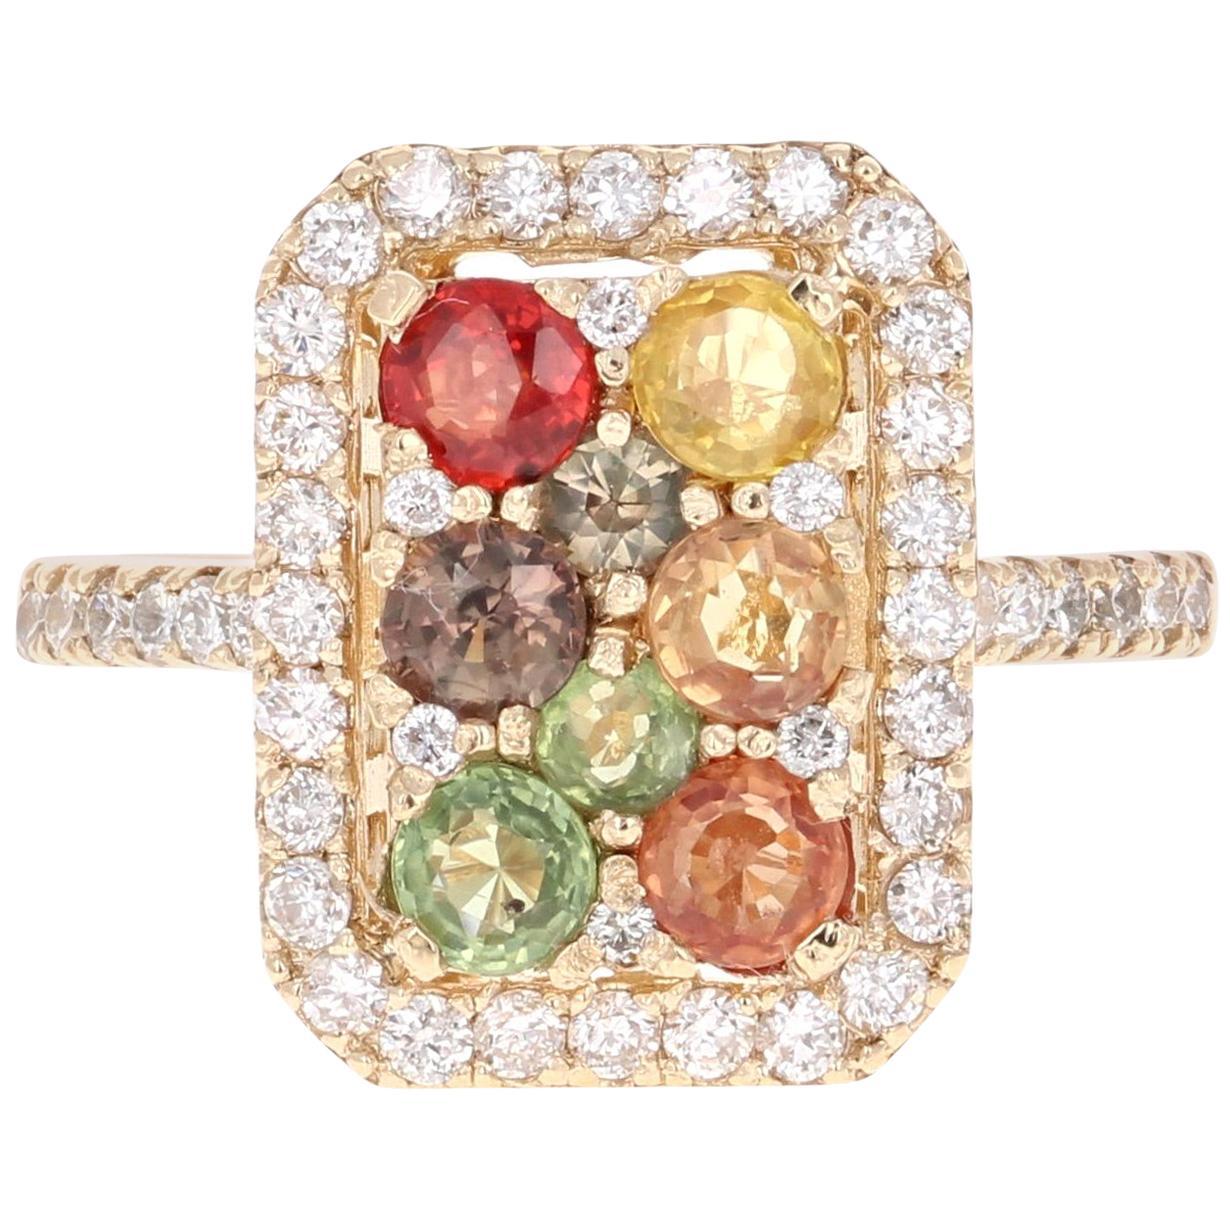 2.24 Carat Multicolored Sapphire Diamond 14 Karat Yellow Gold Cluster Ring